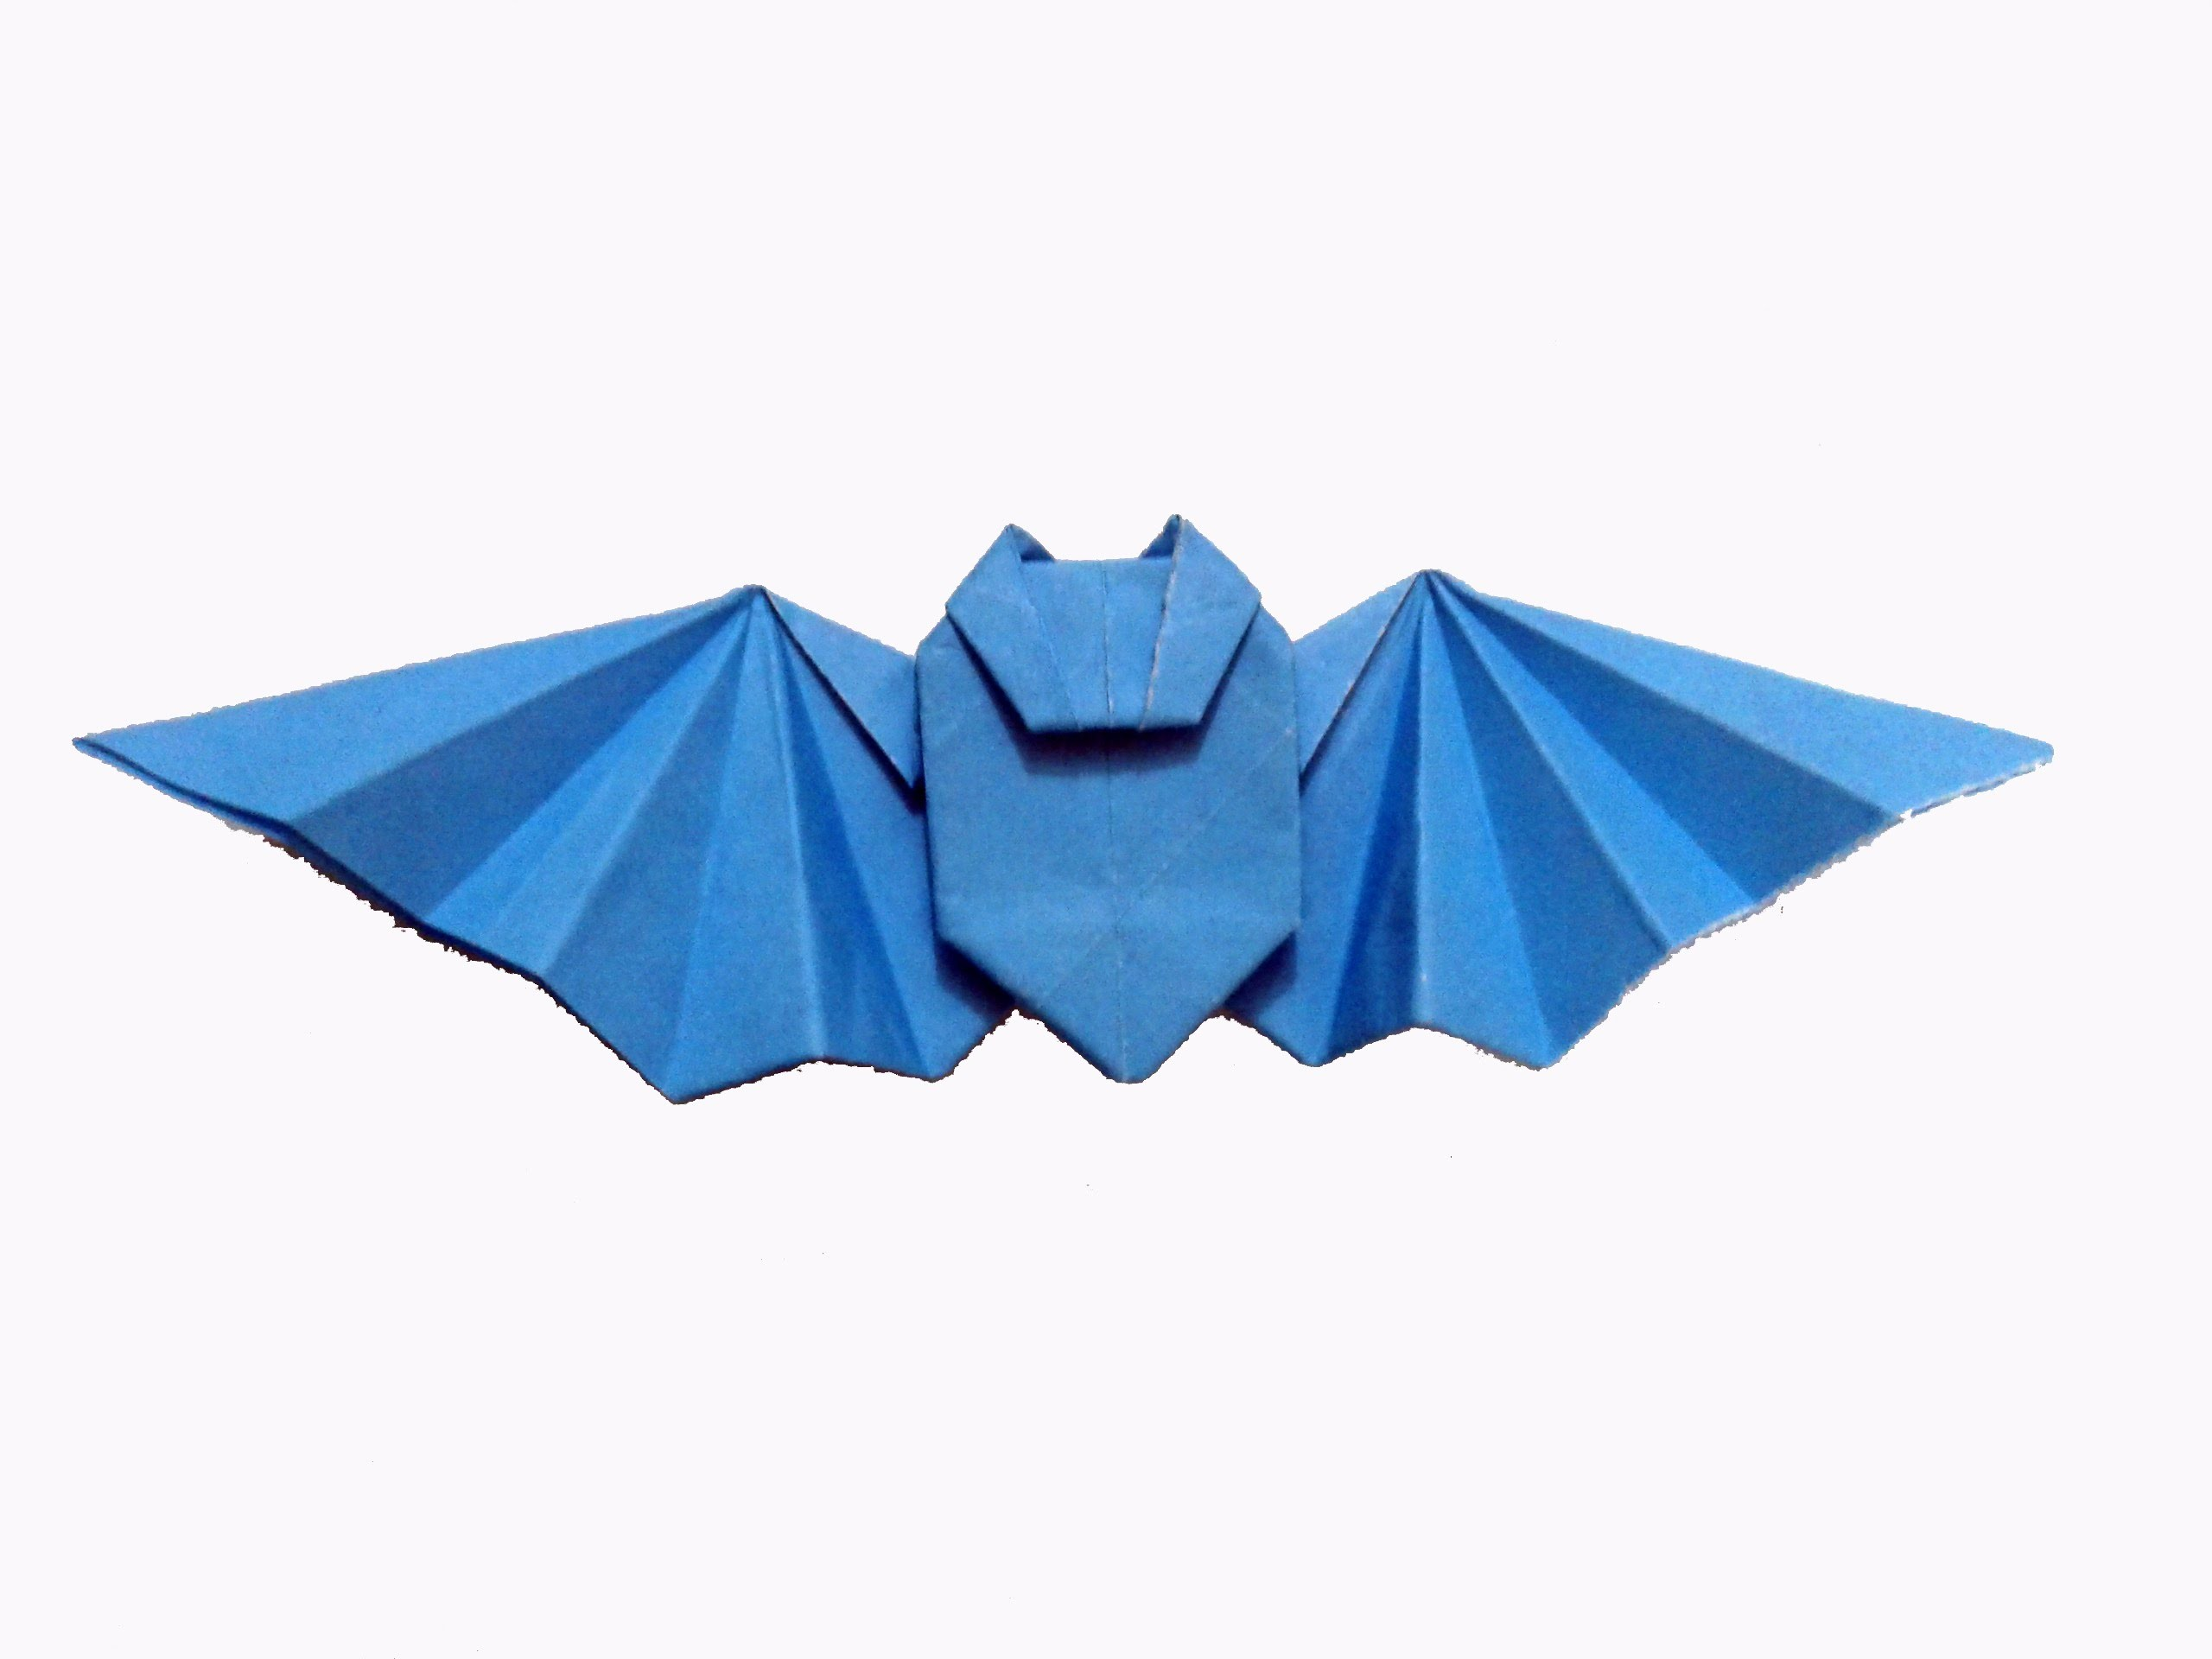 Origami Bat for Kids